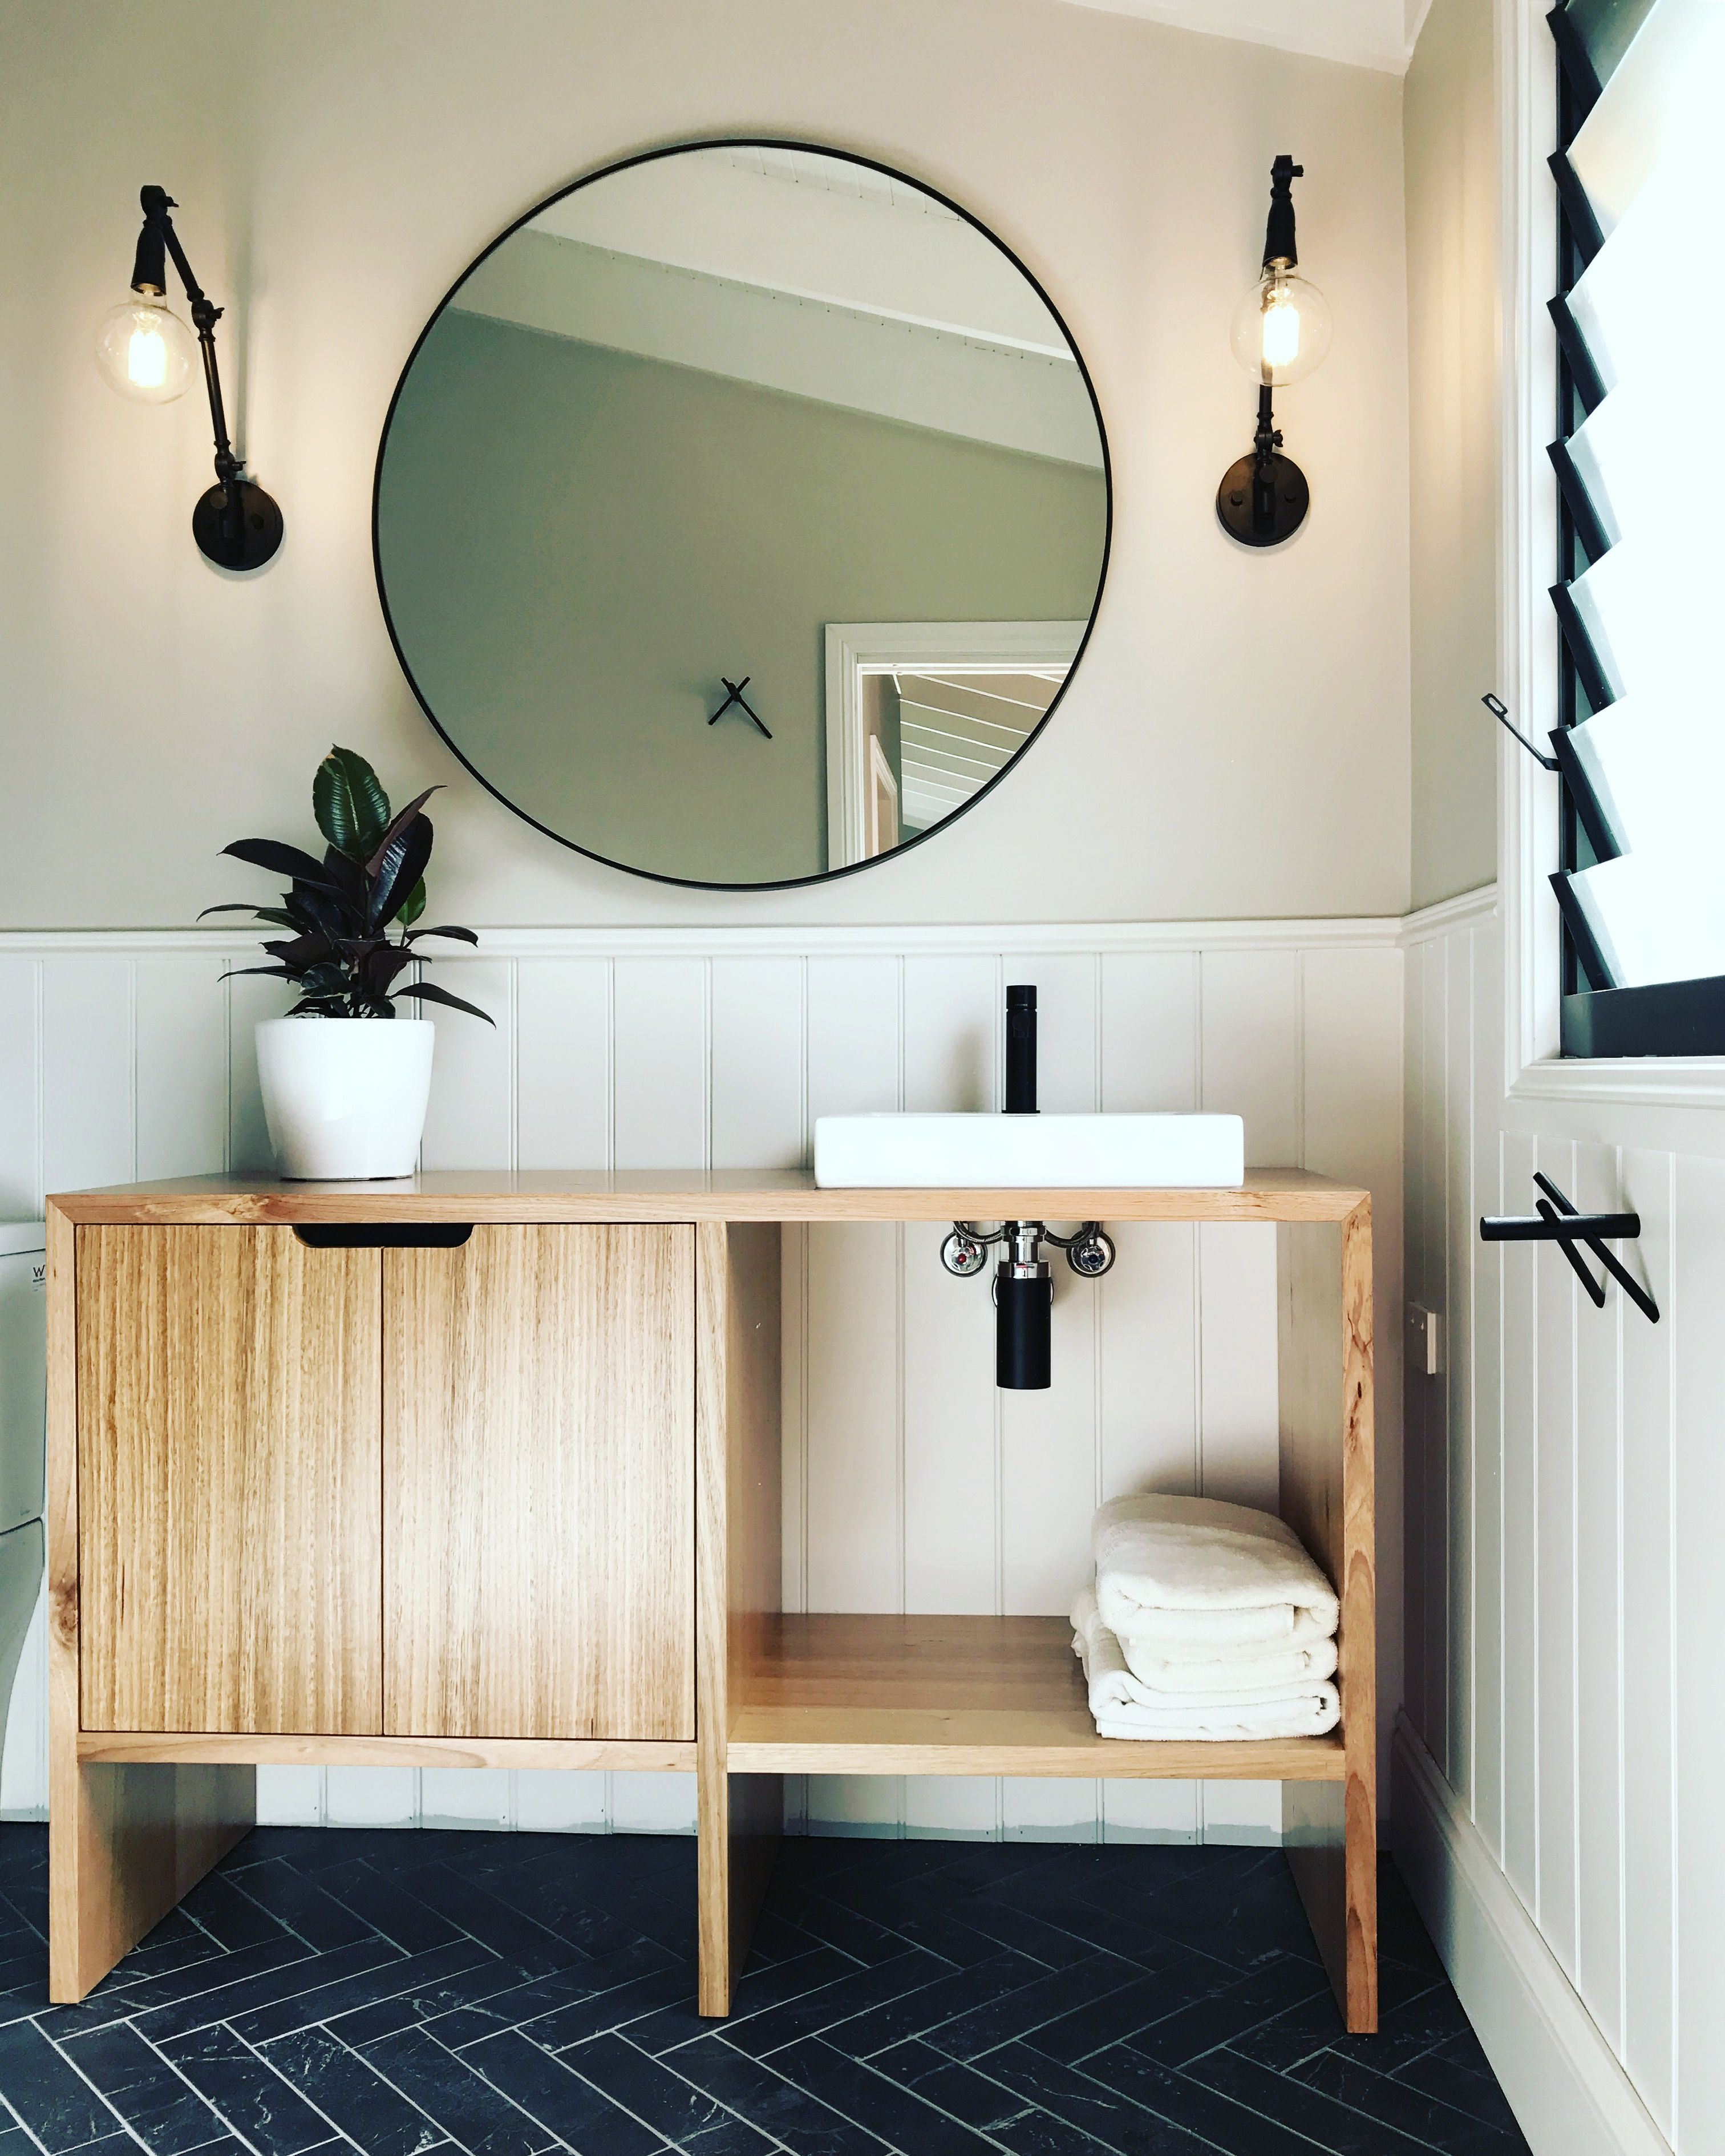 Modern Bathrooms Industrial Bathrooms Timber Vanity Counter Top - Industrial bathroom wall lights